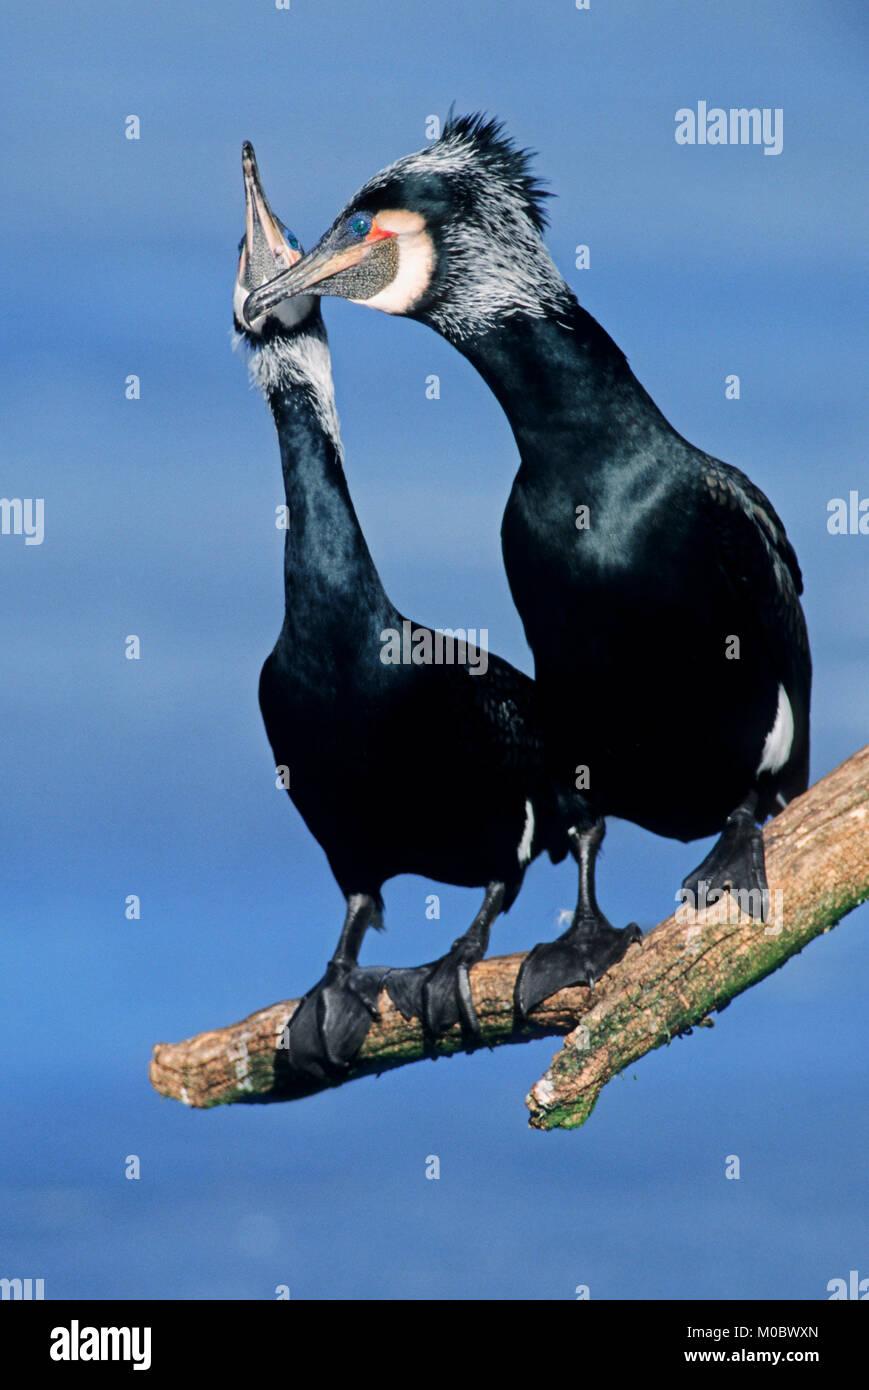 Great Cormorant, pair courting, North Rhine-Westphalia, Germany   | Kormorane, Paar balzend, Nordrhein-Westfalen, - Stock Image